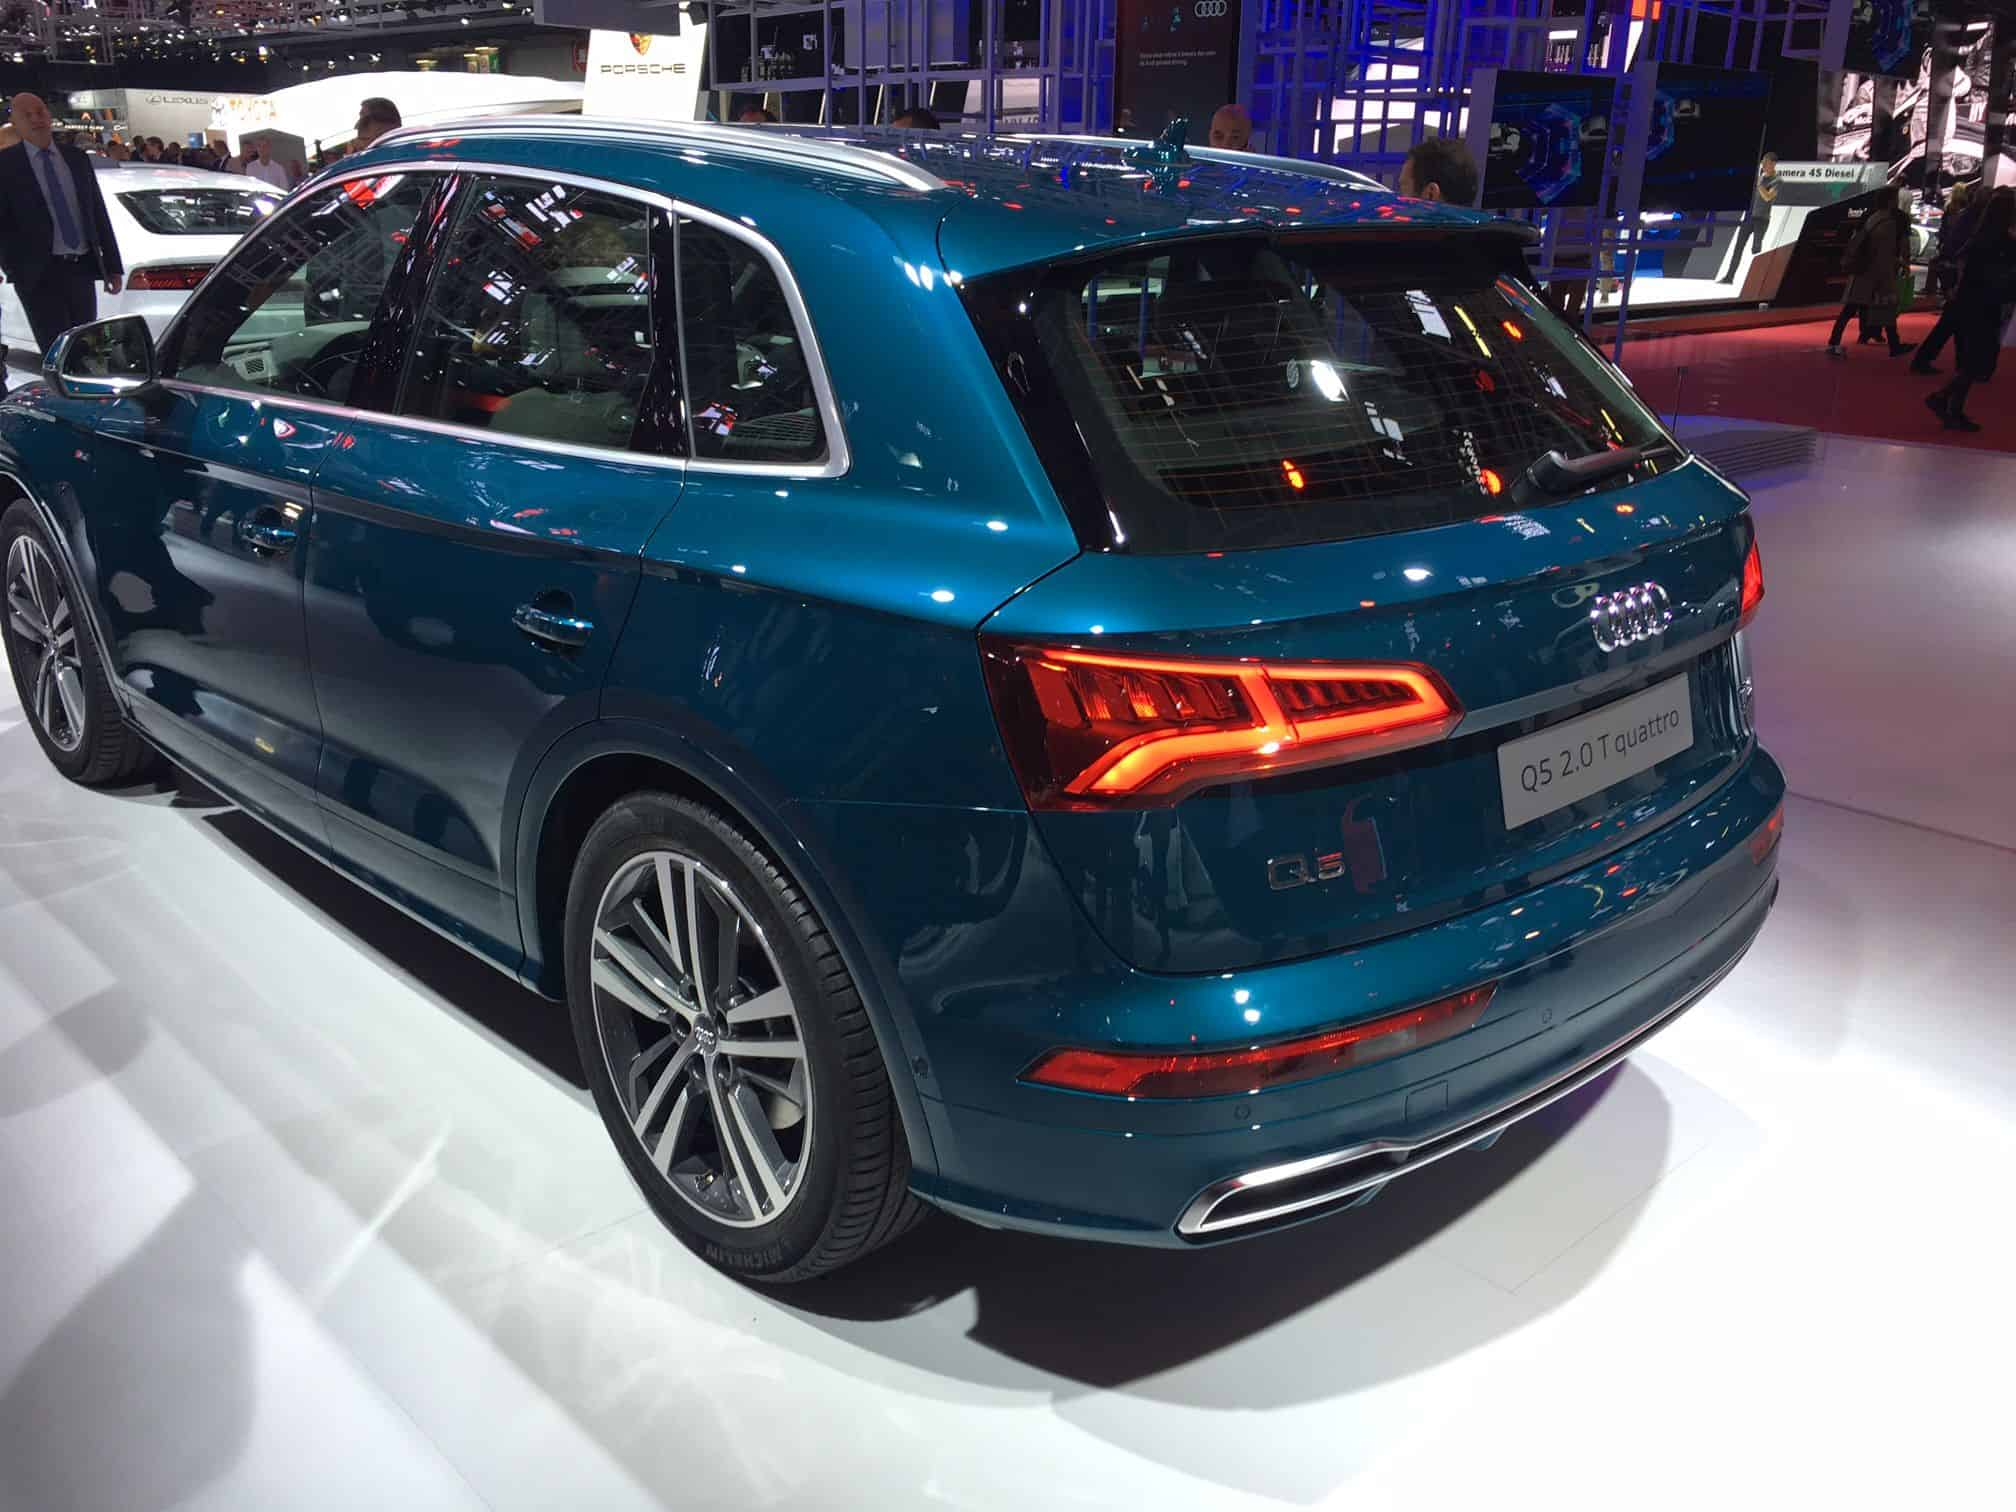 Neuer Audi Q5 kommt Anfang 2017 | Der-Autotester.de on